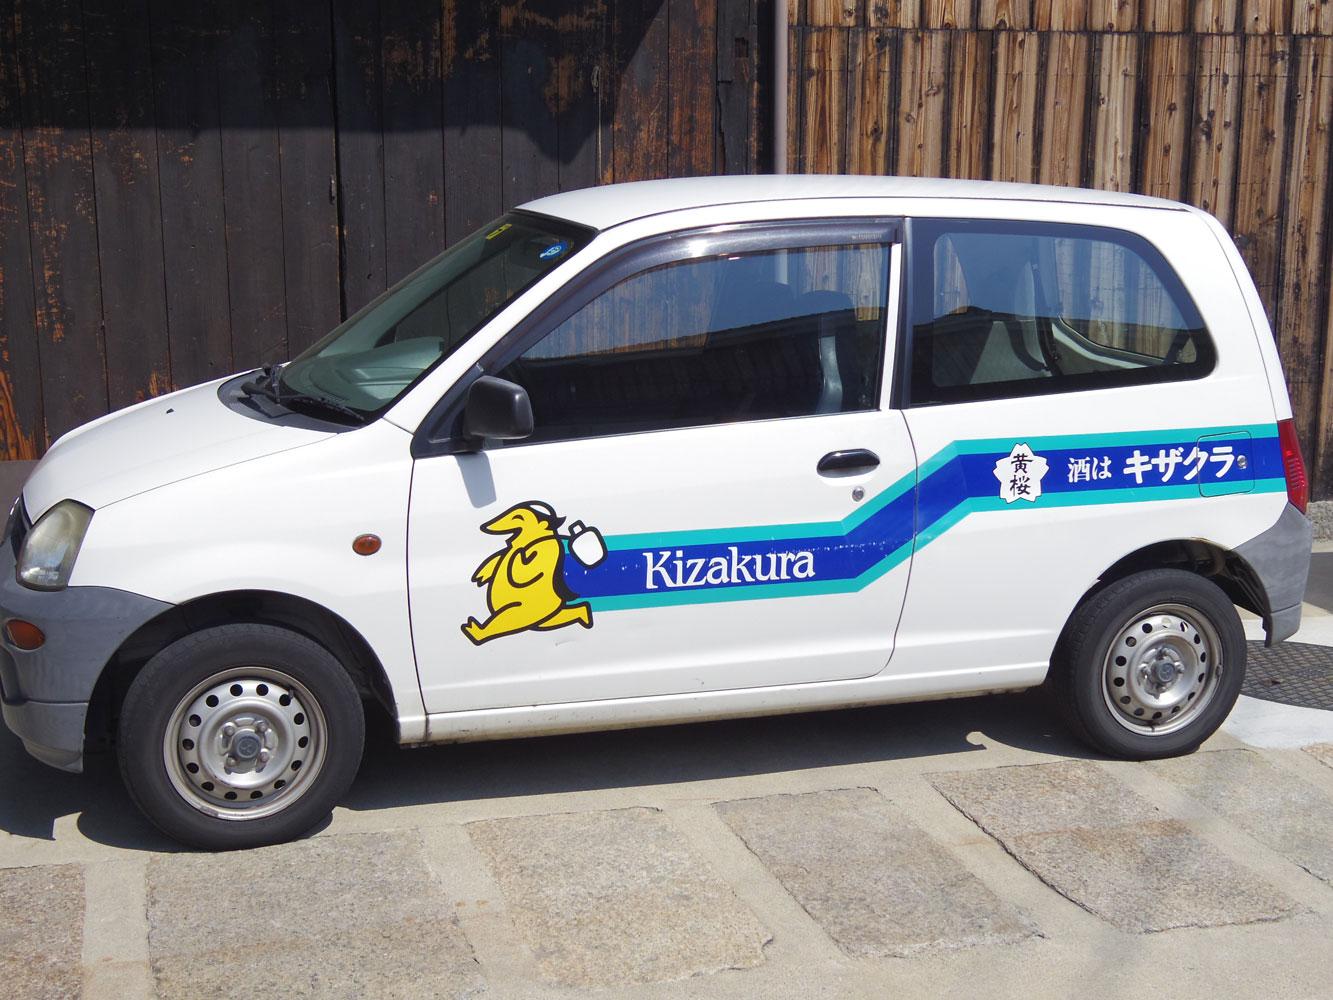 kizakura20150515.jpg